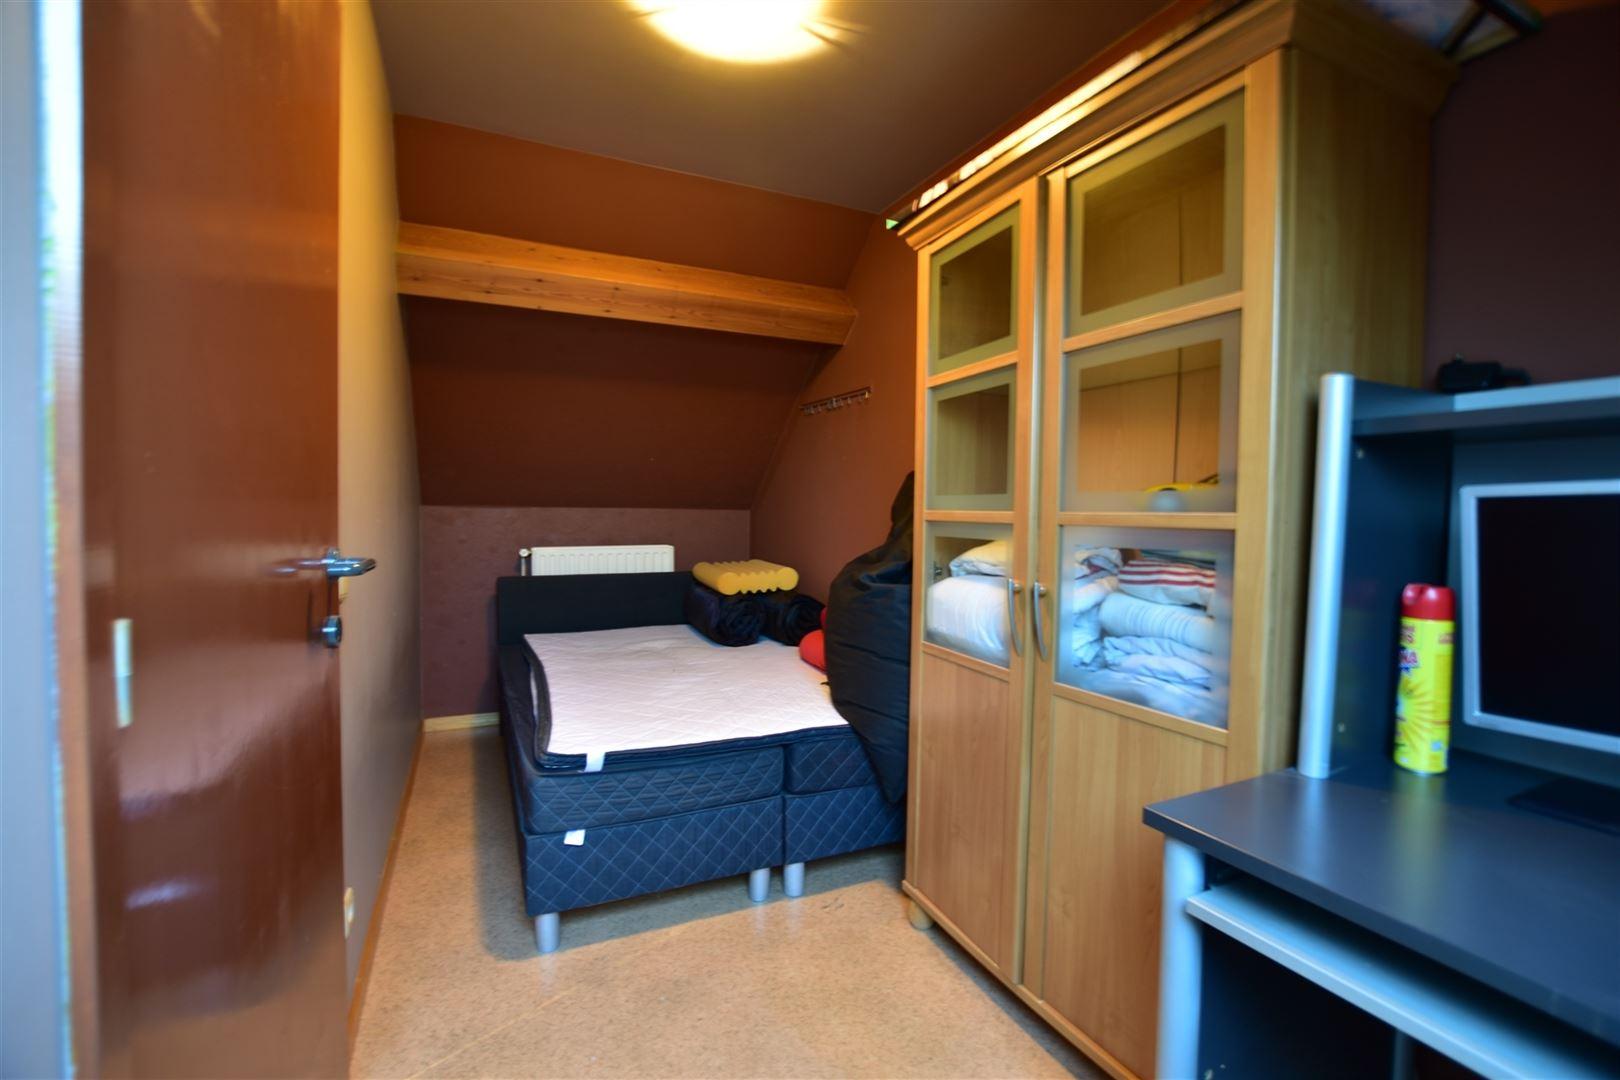 Foto 13 : Duplex/triplex te 9200 BAASRODE (België) - Prijs € 159.000